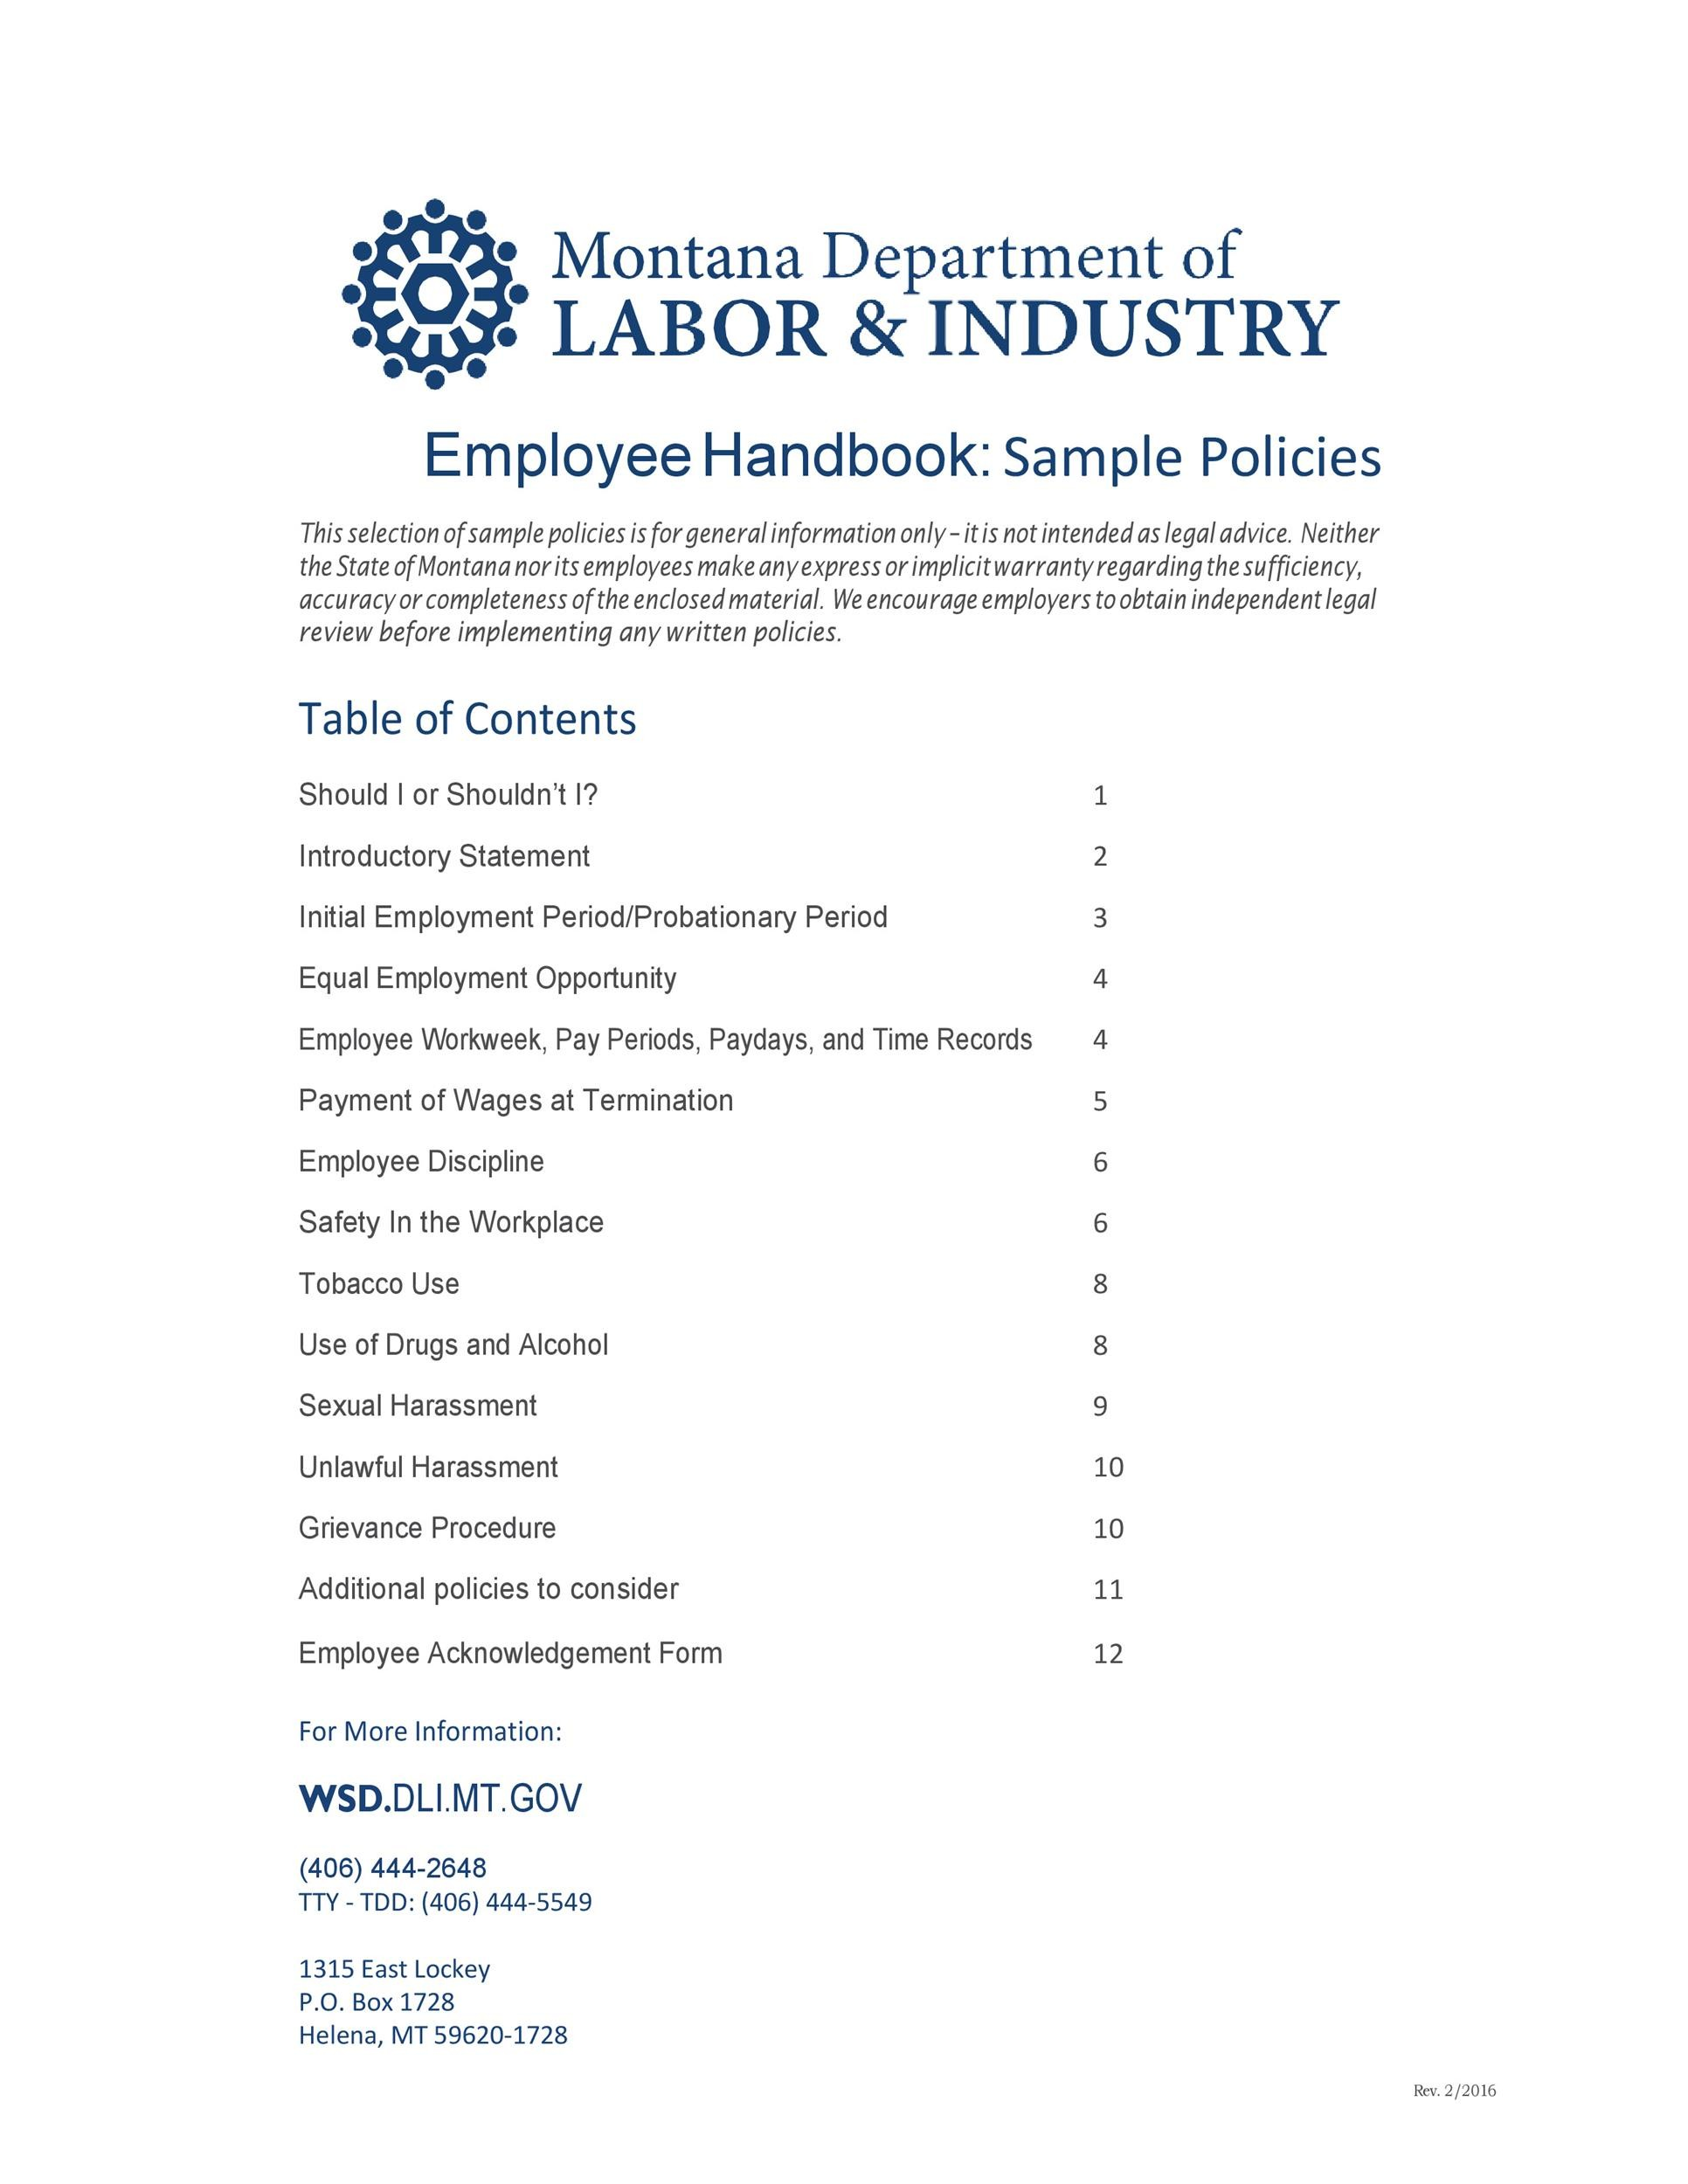 Free employee handbook template 17